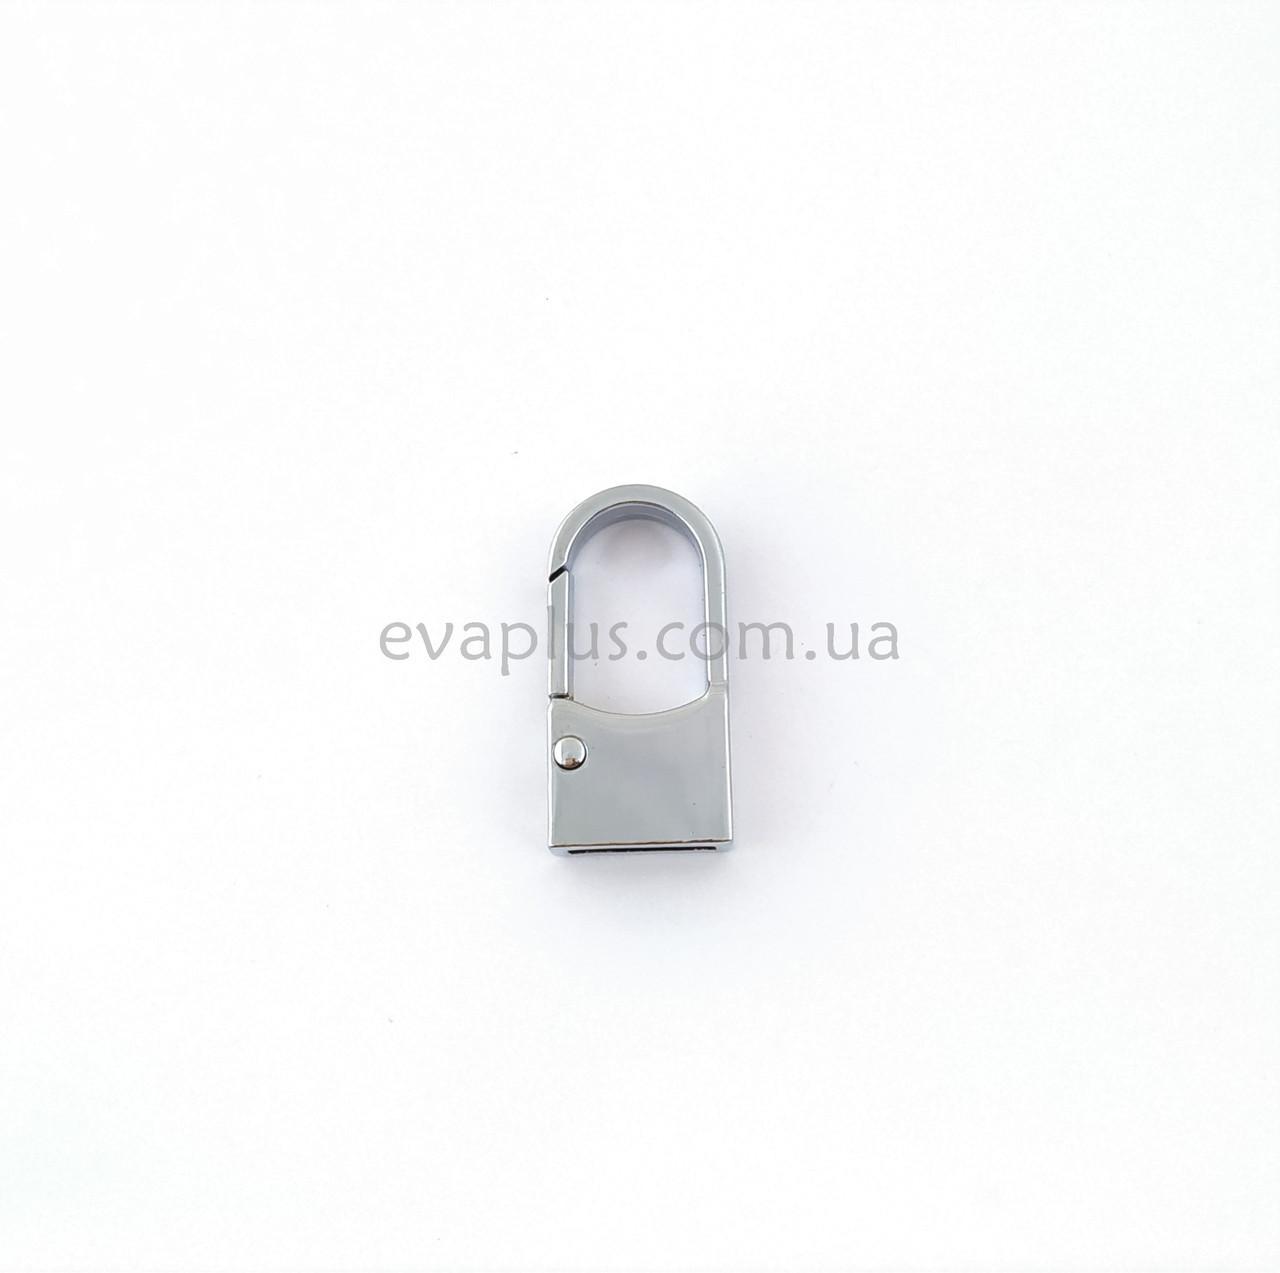 Карабин для сумки 40мм/20мм ЛД-1916 никель